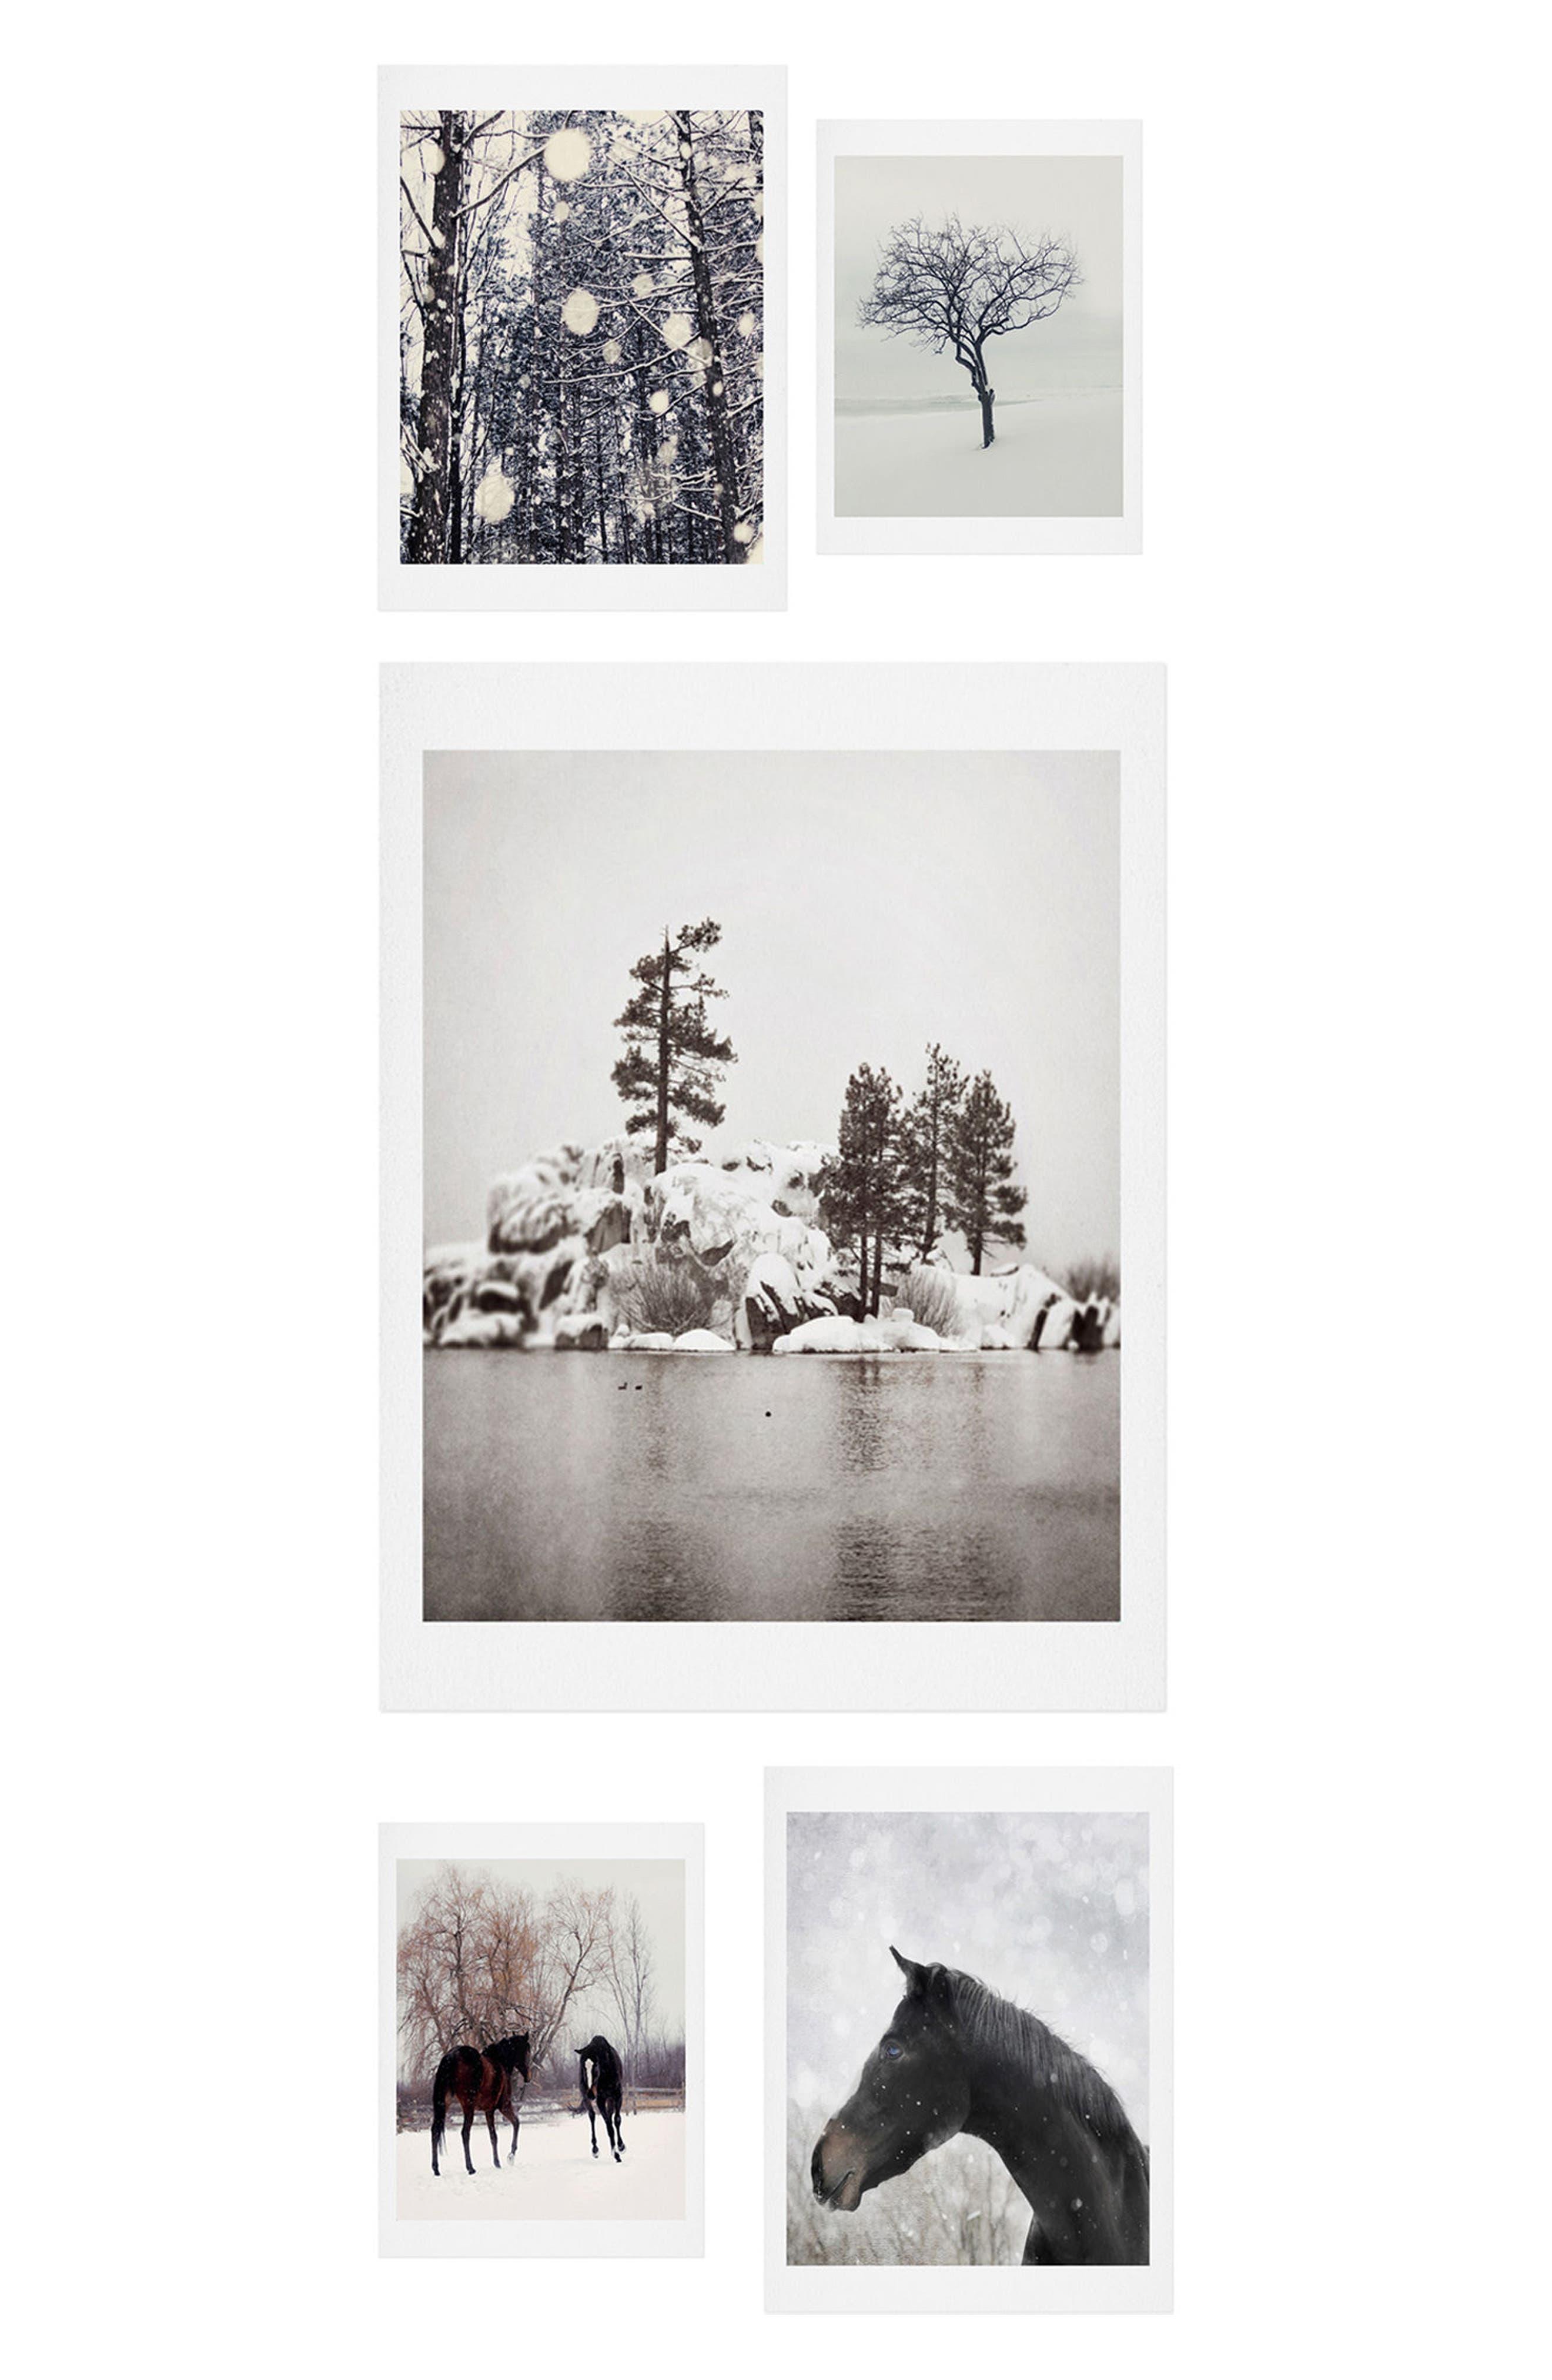 Alternate Image 1 Selected - Deny Designs Winter Farm 5-Piece Gallery Wall Art Print Set